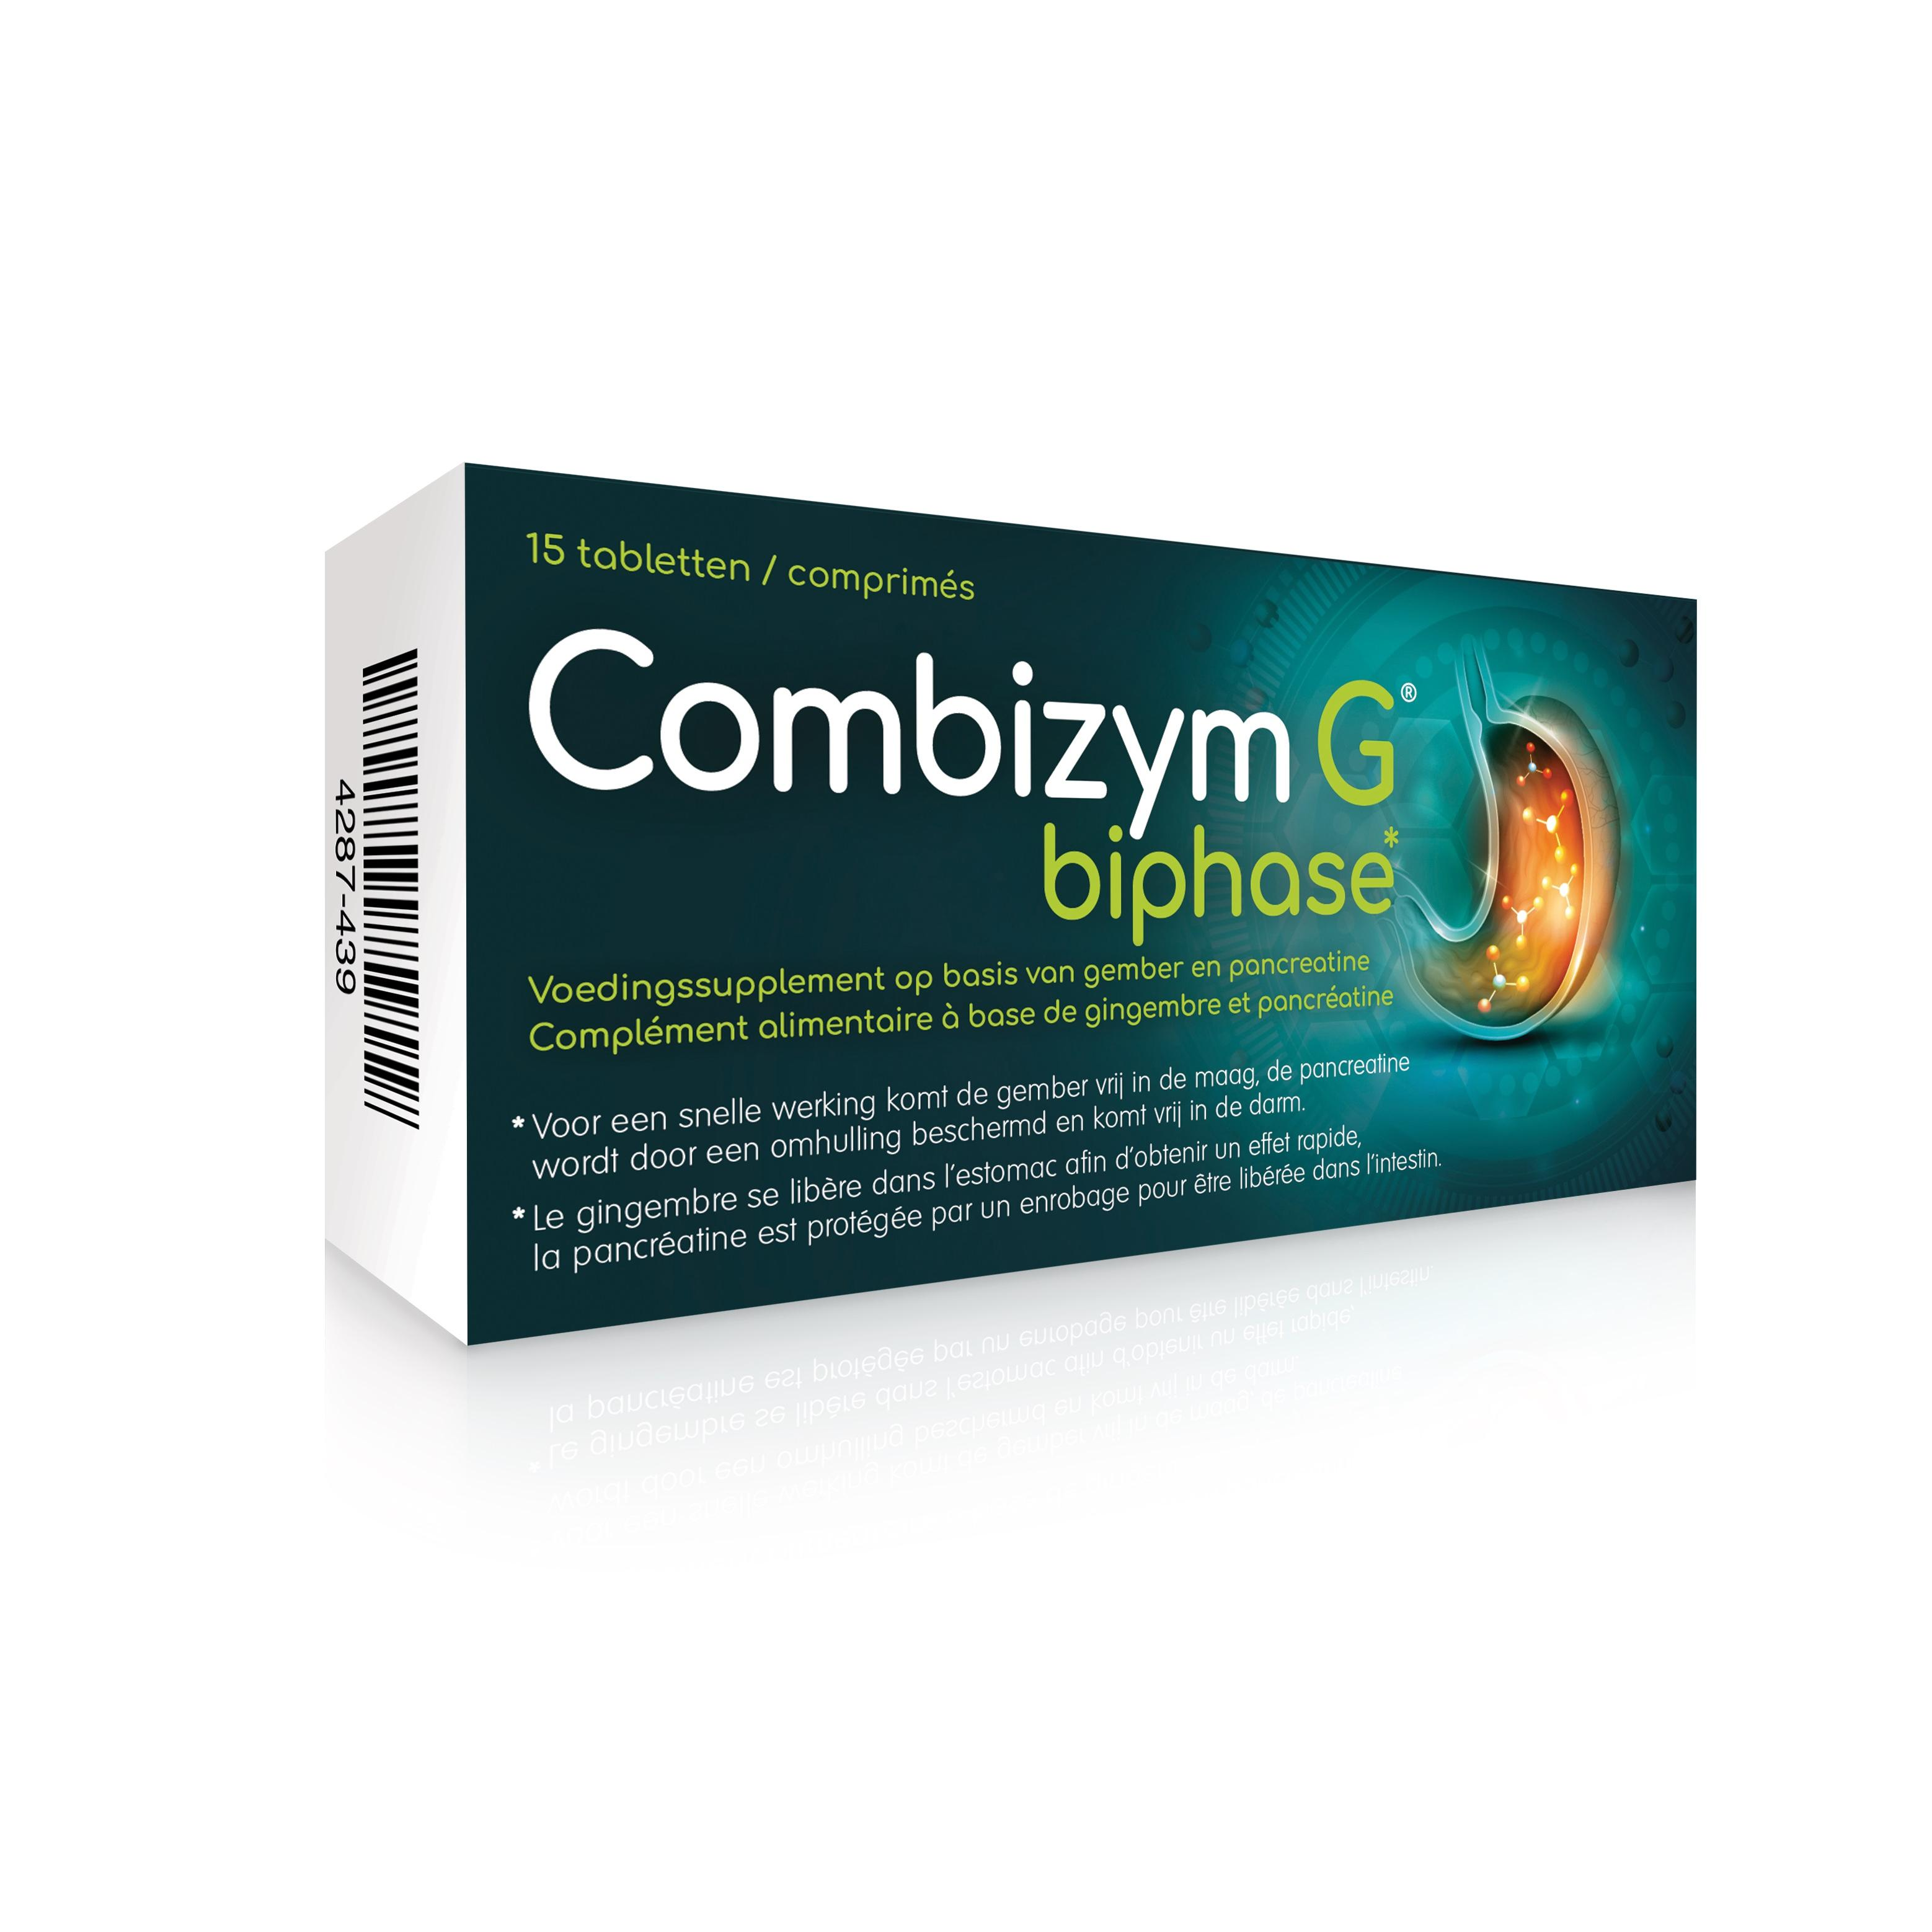 Image of Combizym G Biphase Zware maag & vertering